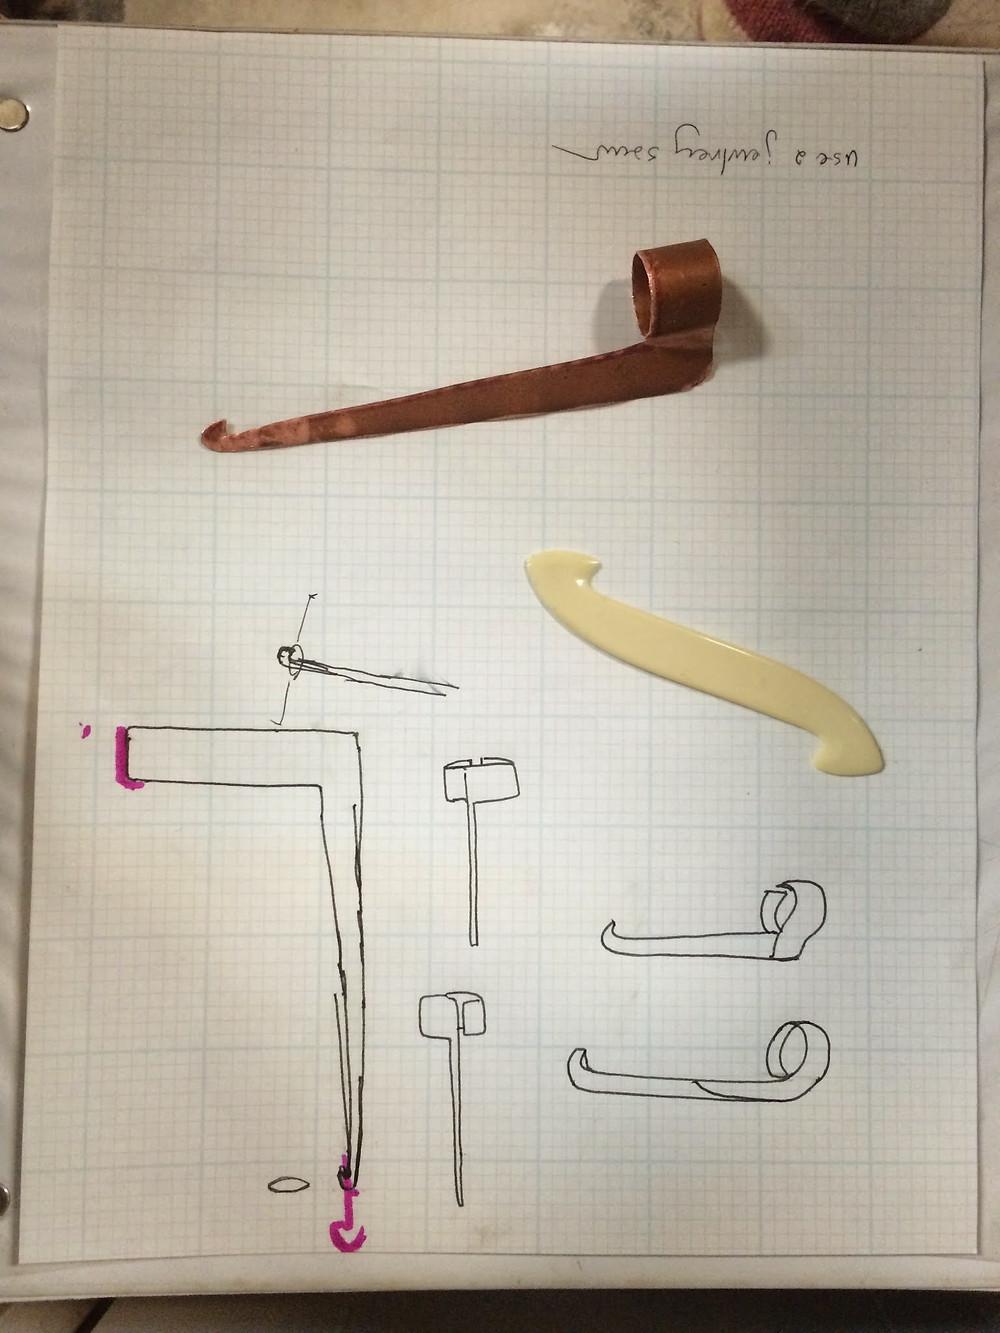 Picasa - finshed sleigh hook and drawings.jpg